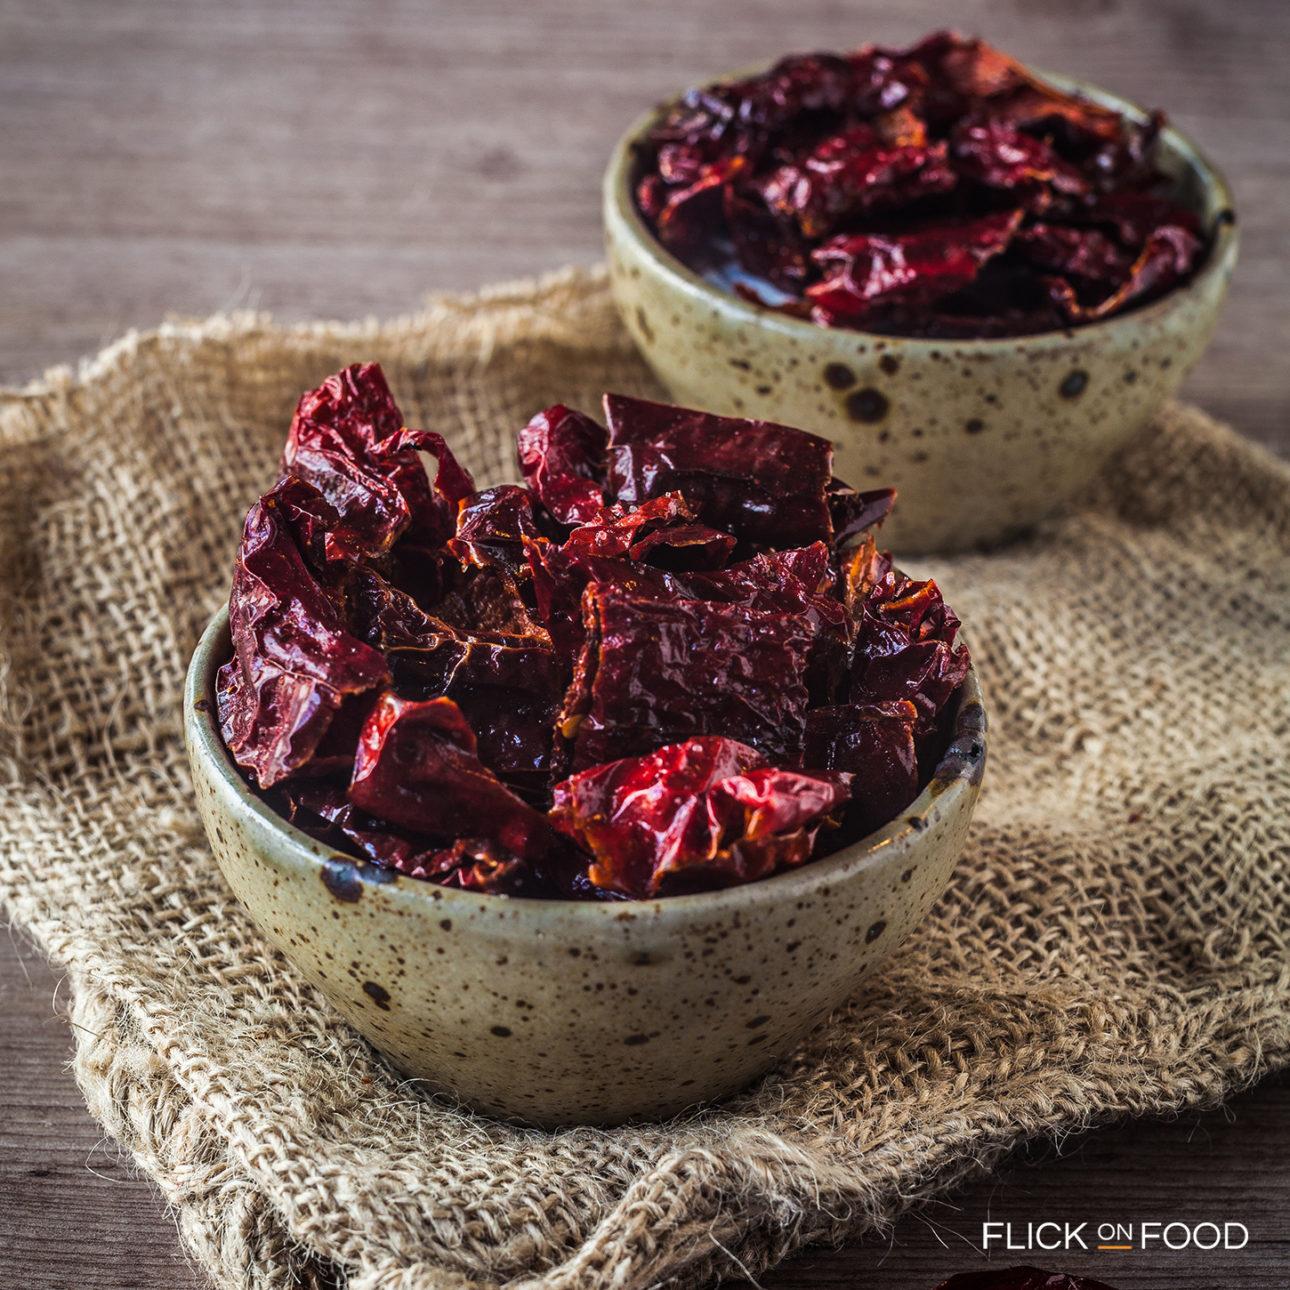 Peperone di Senise IGP | Flick on Food